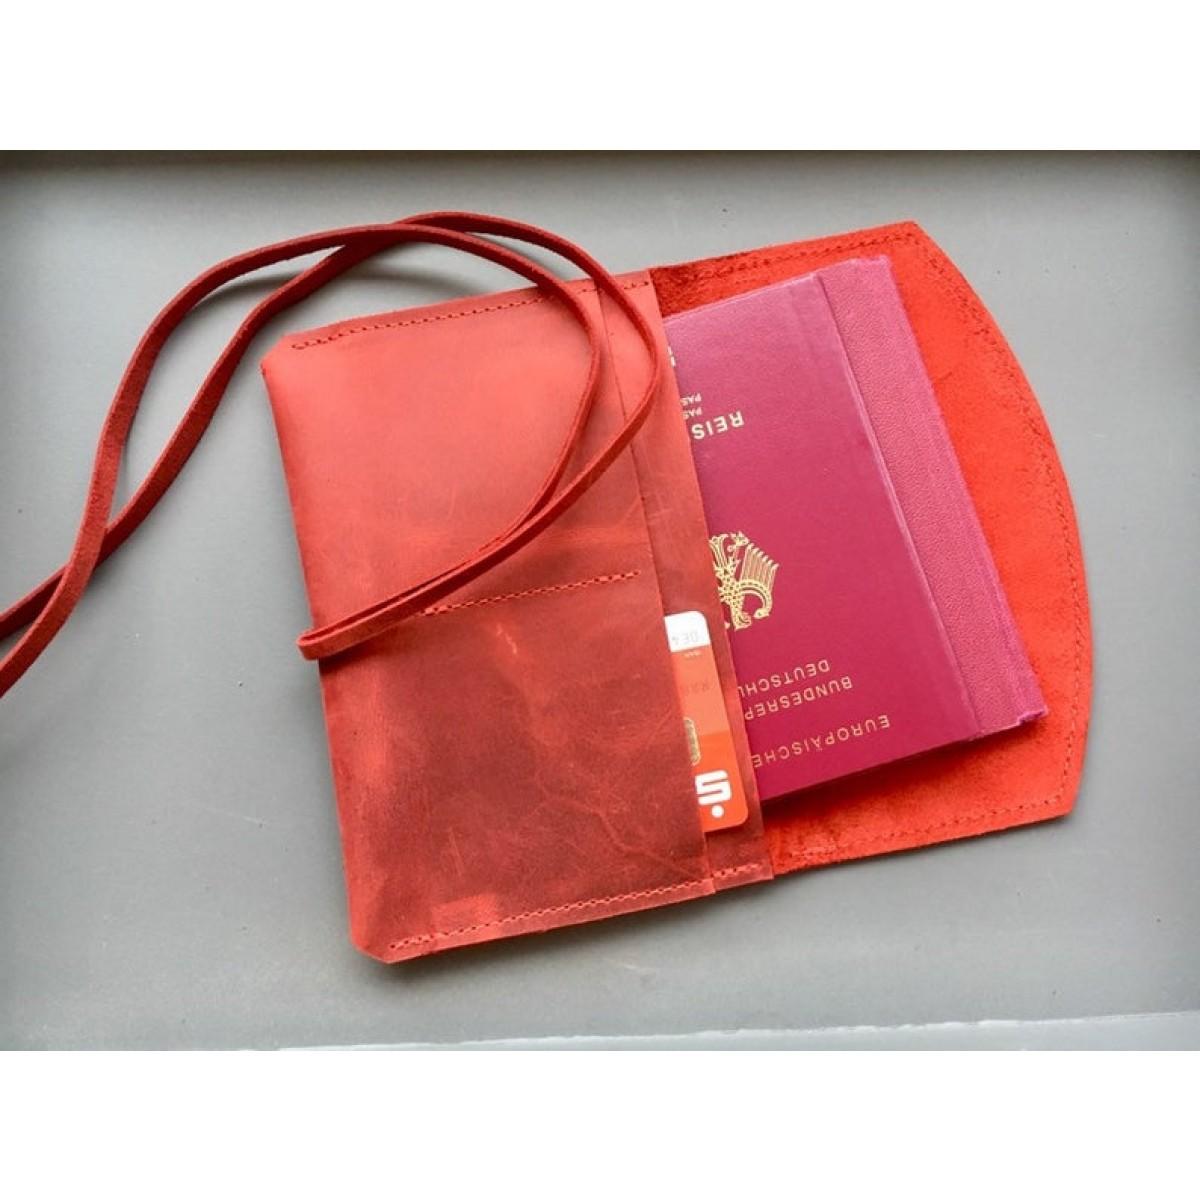 BSAITE / Reisepasshülle aus echtem Leder / Reisemäppchen / Tabakbeutel / Organizer